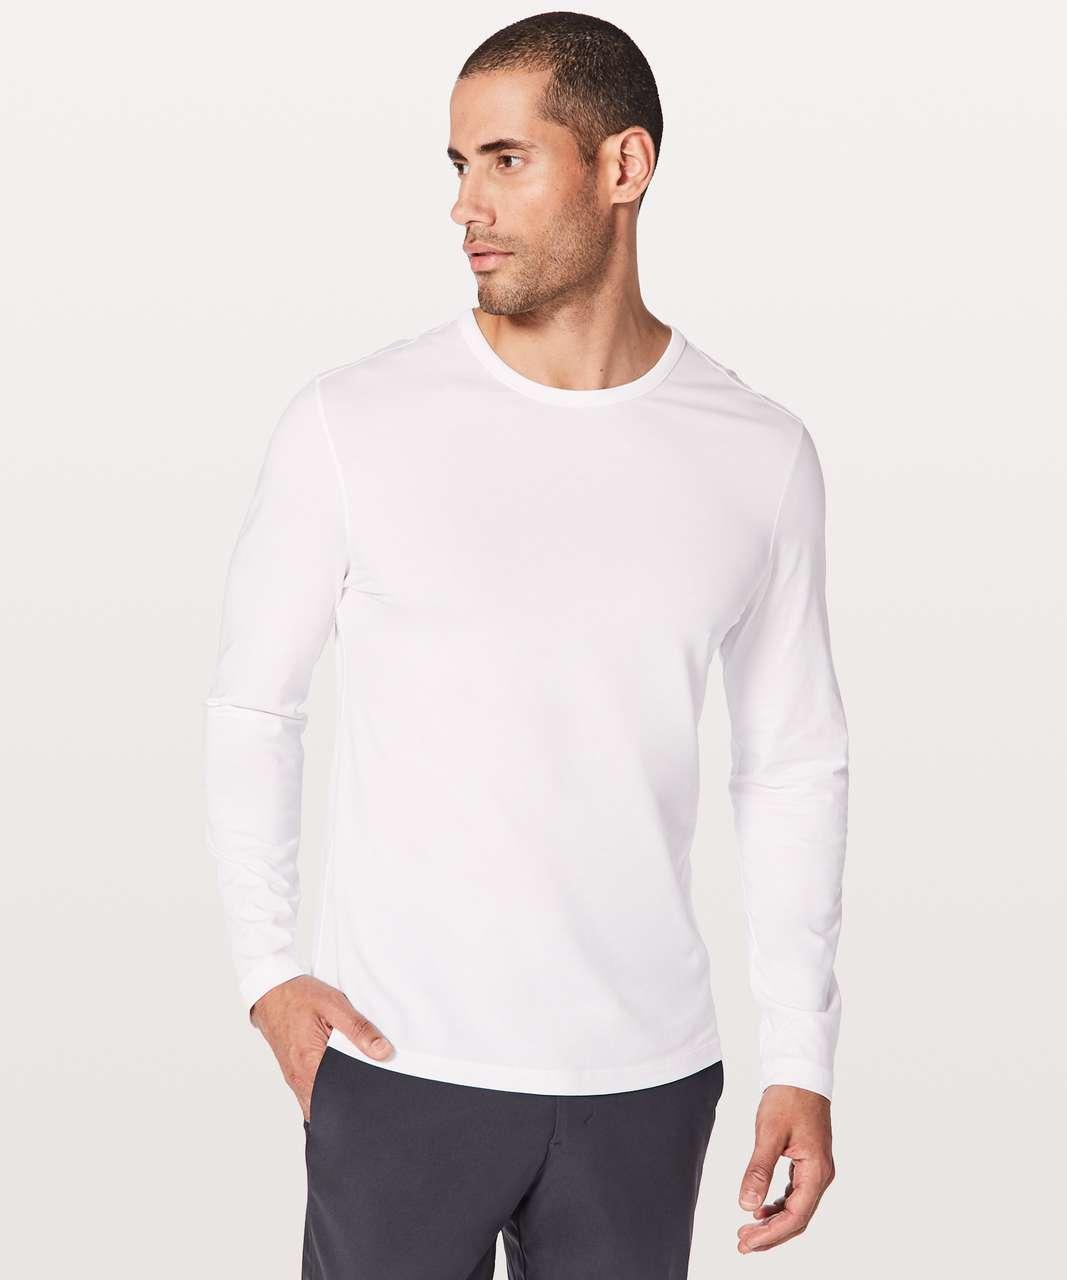 3596fc1a8e8a Lululemon 5 Year Basic Long Sleeve - White - lulu fanatics